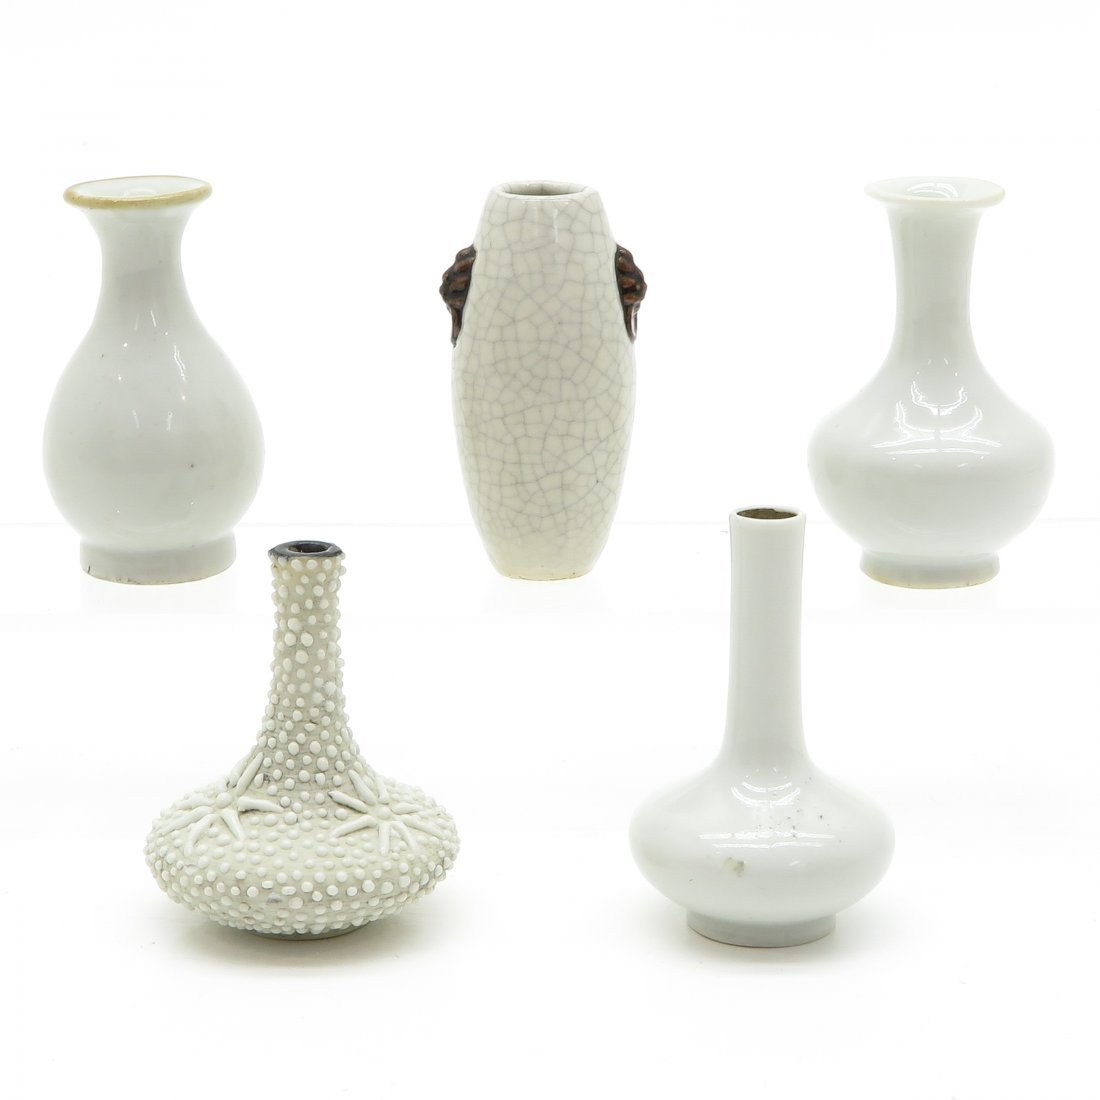 Lot of 5 China Porcelain Miniature Vases - 3